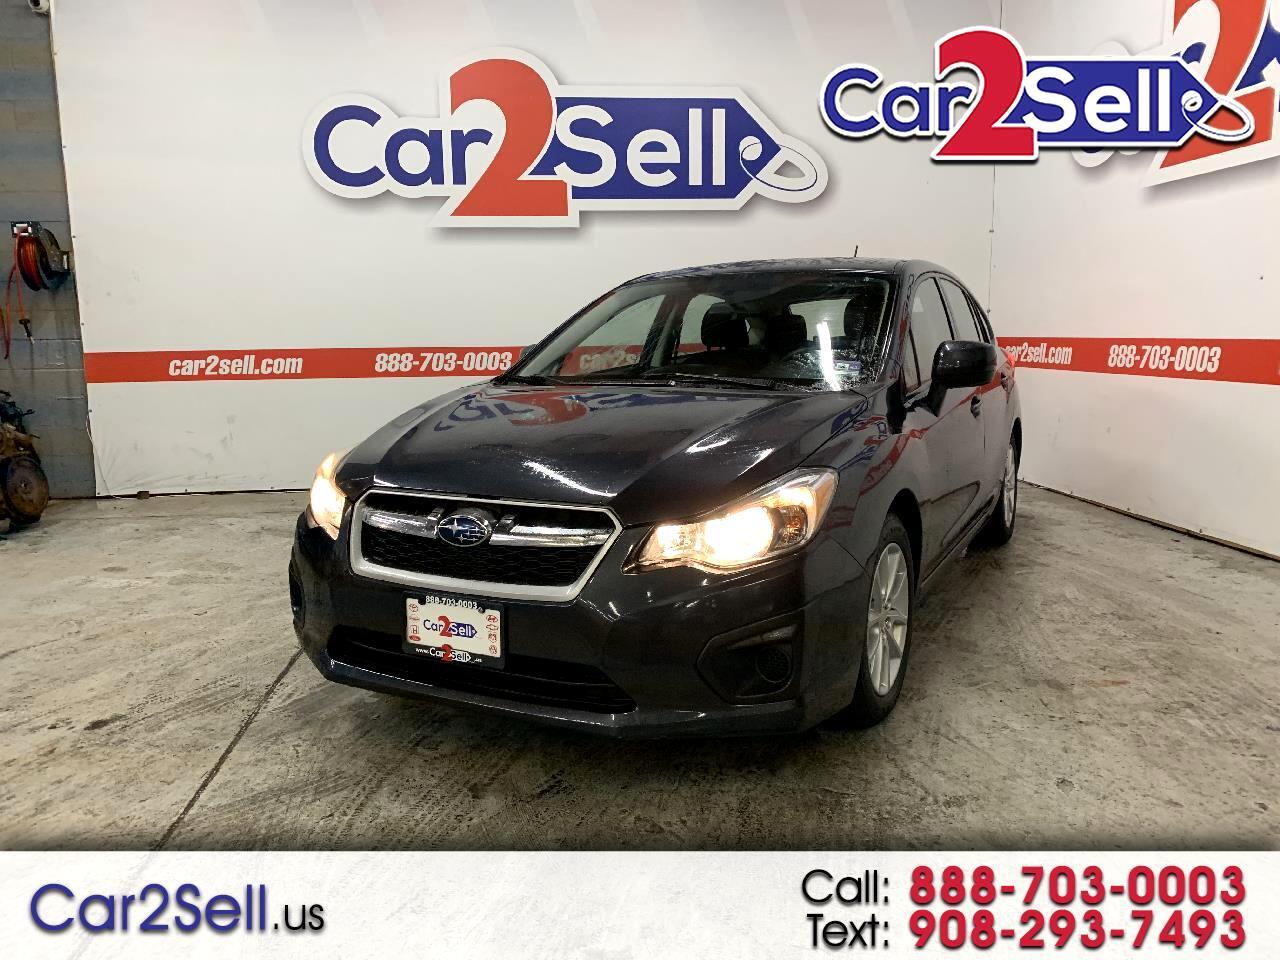 Subaru Impreza Wagon 5dr Auto 2.0i Premium 2012